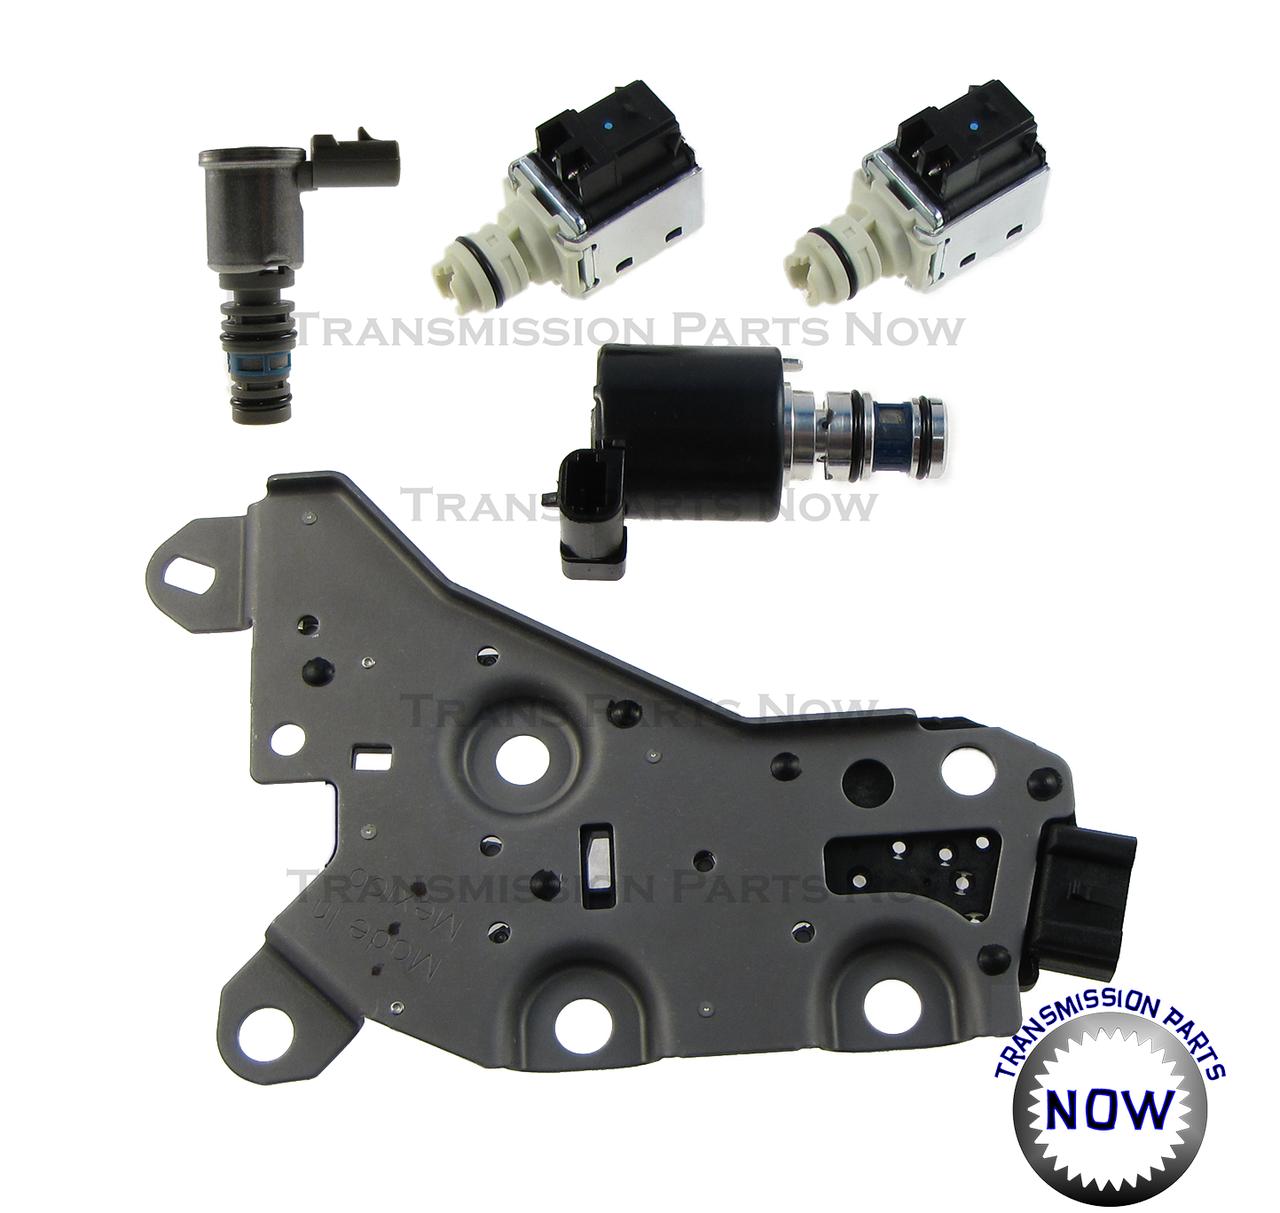 4R44E 4R55E 5R44E 5R55E Ford Mazda Solenoid and 2WD Filter